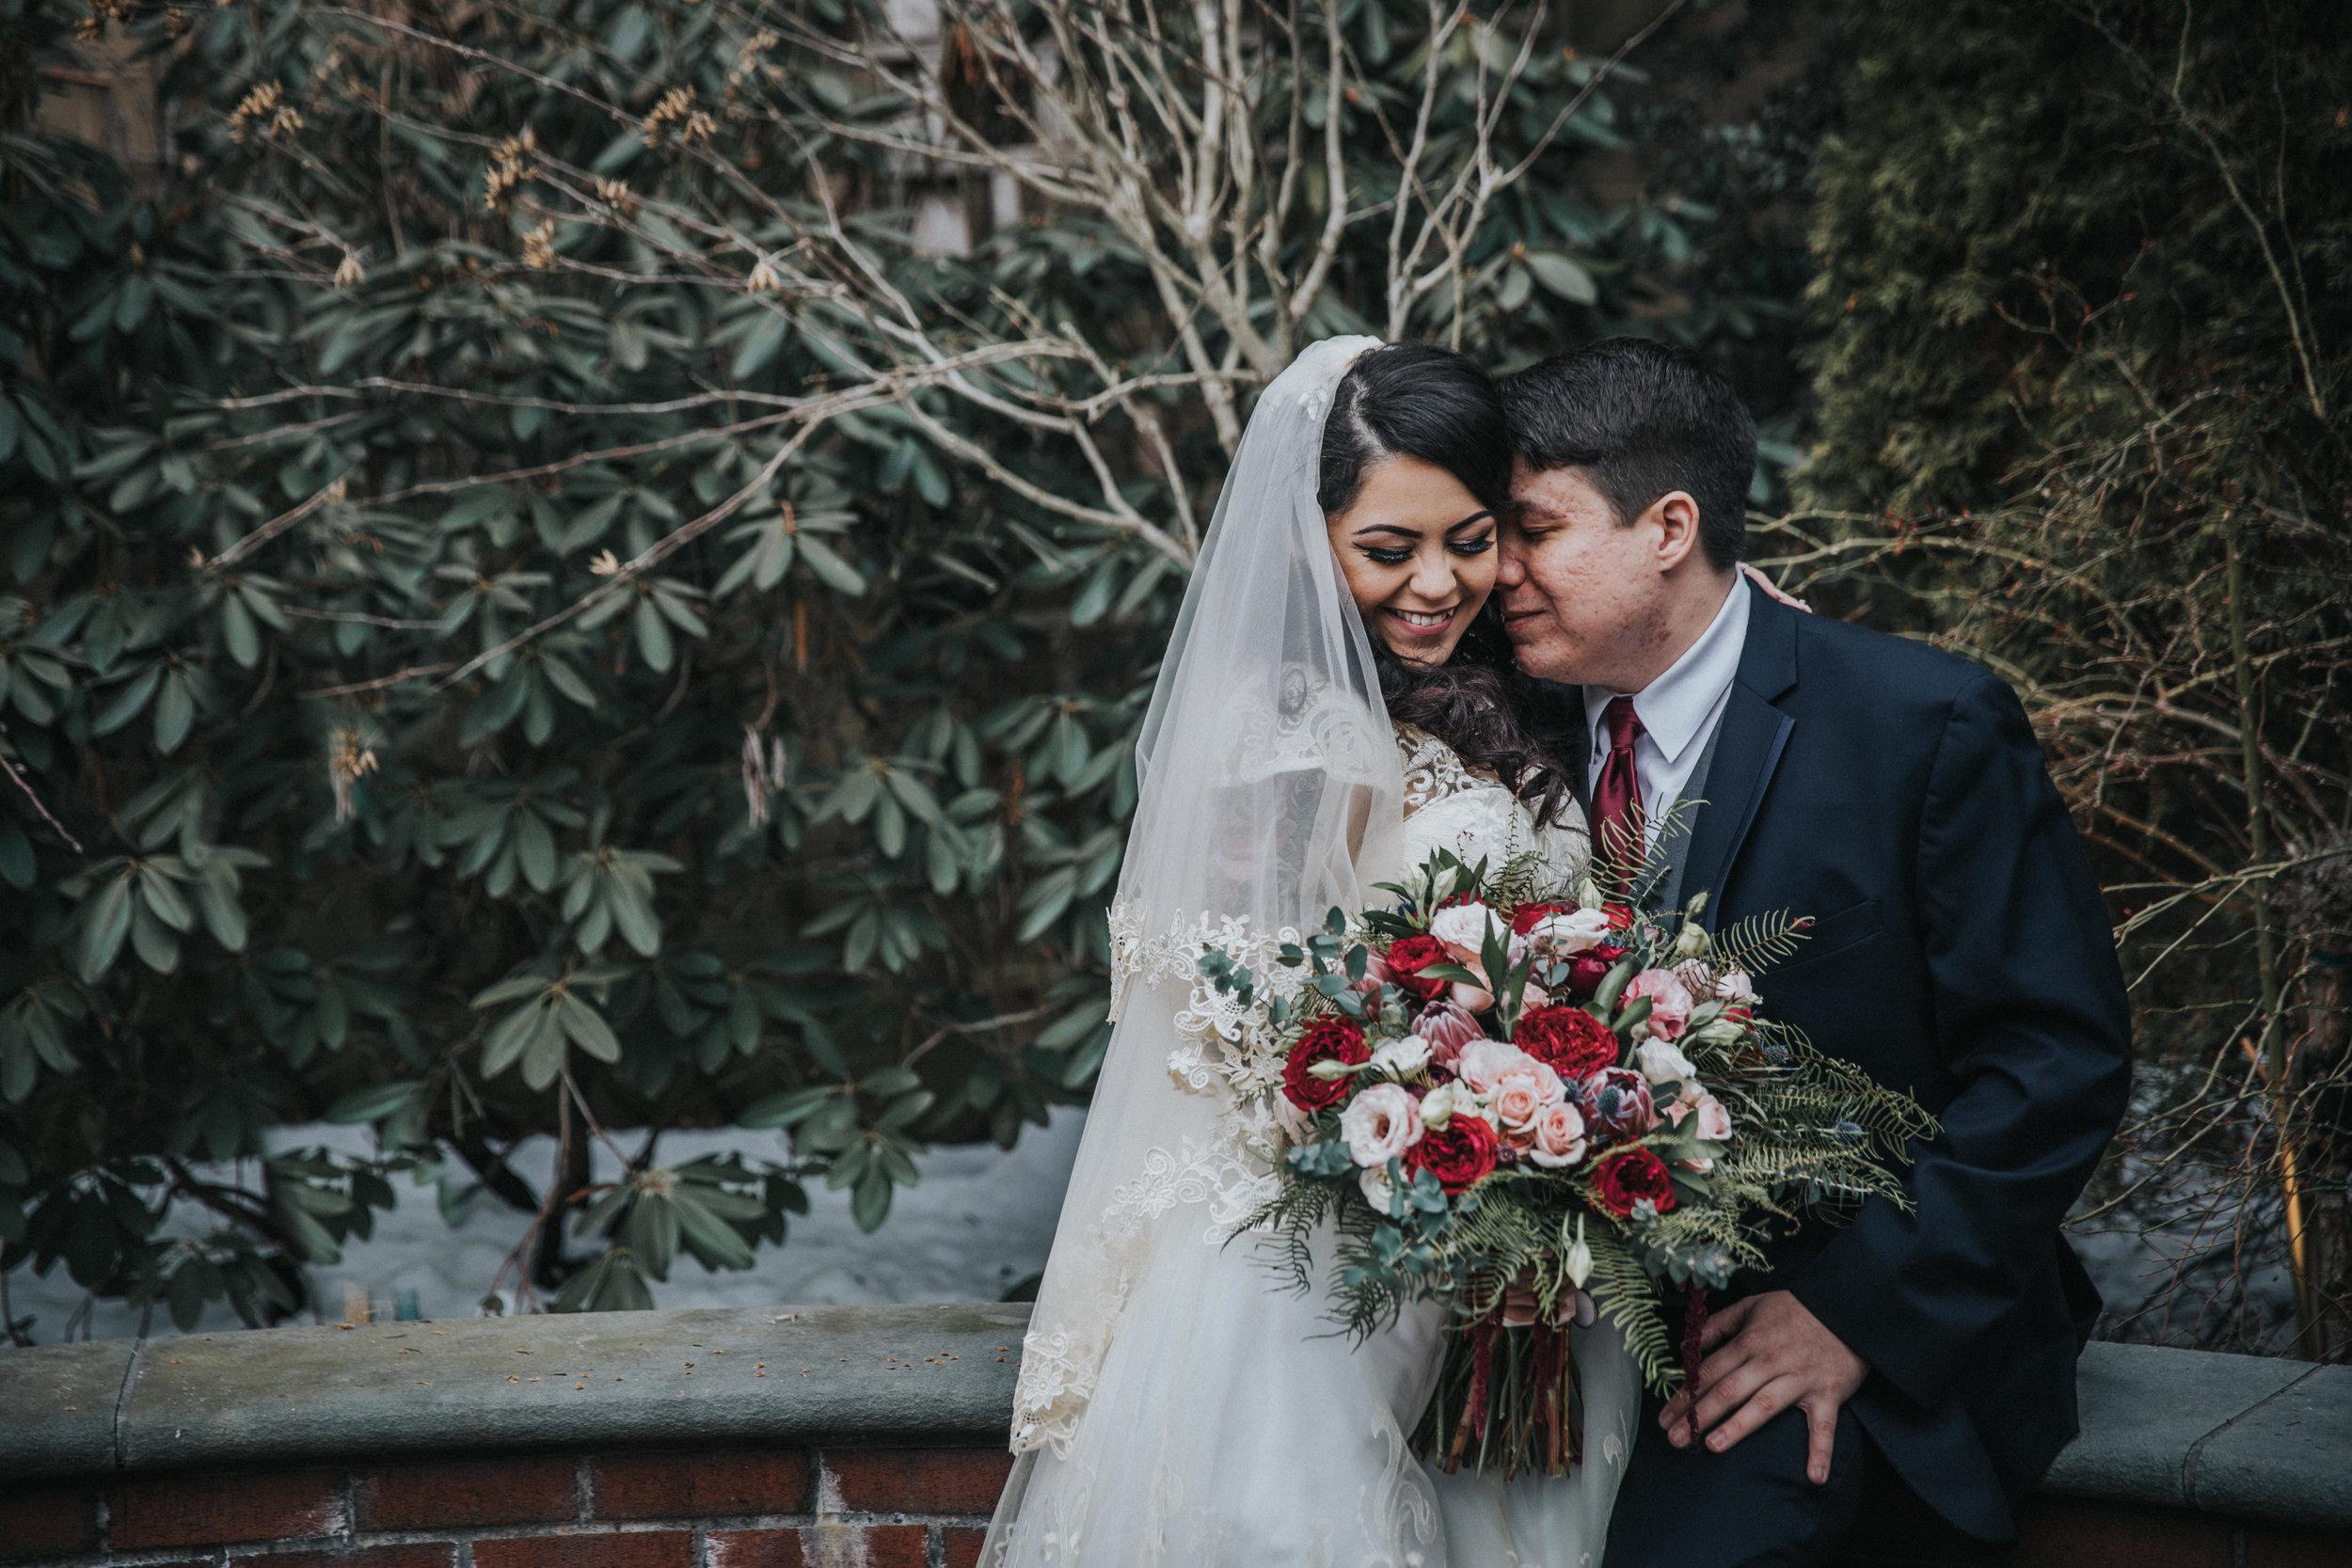 New-Jersey-Wedding-Photographer-ReceptionCenter-Valeria&Mike-First-Look-Bride&Groom (65 of 69).jpg